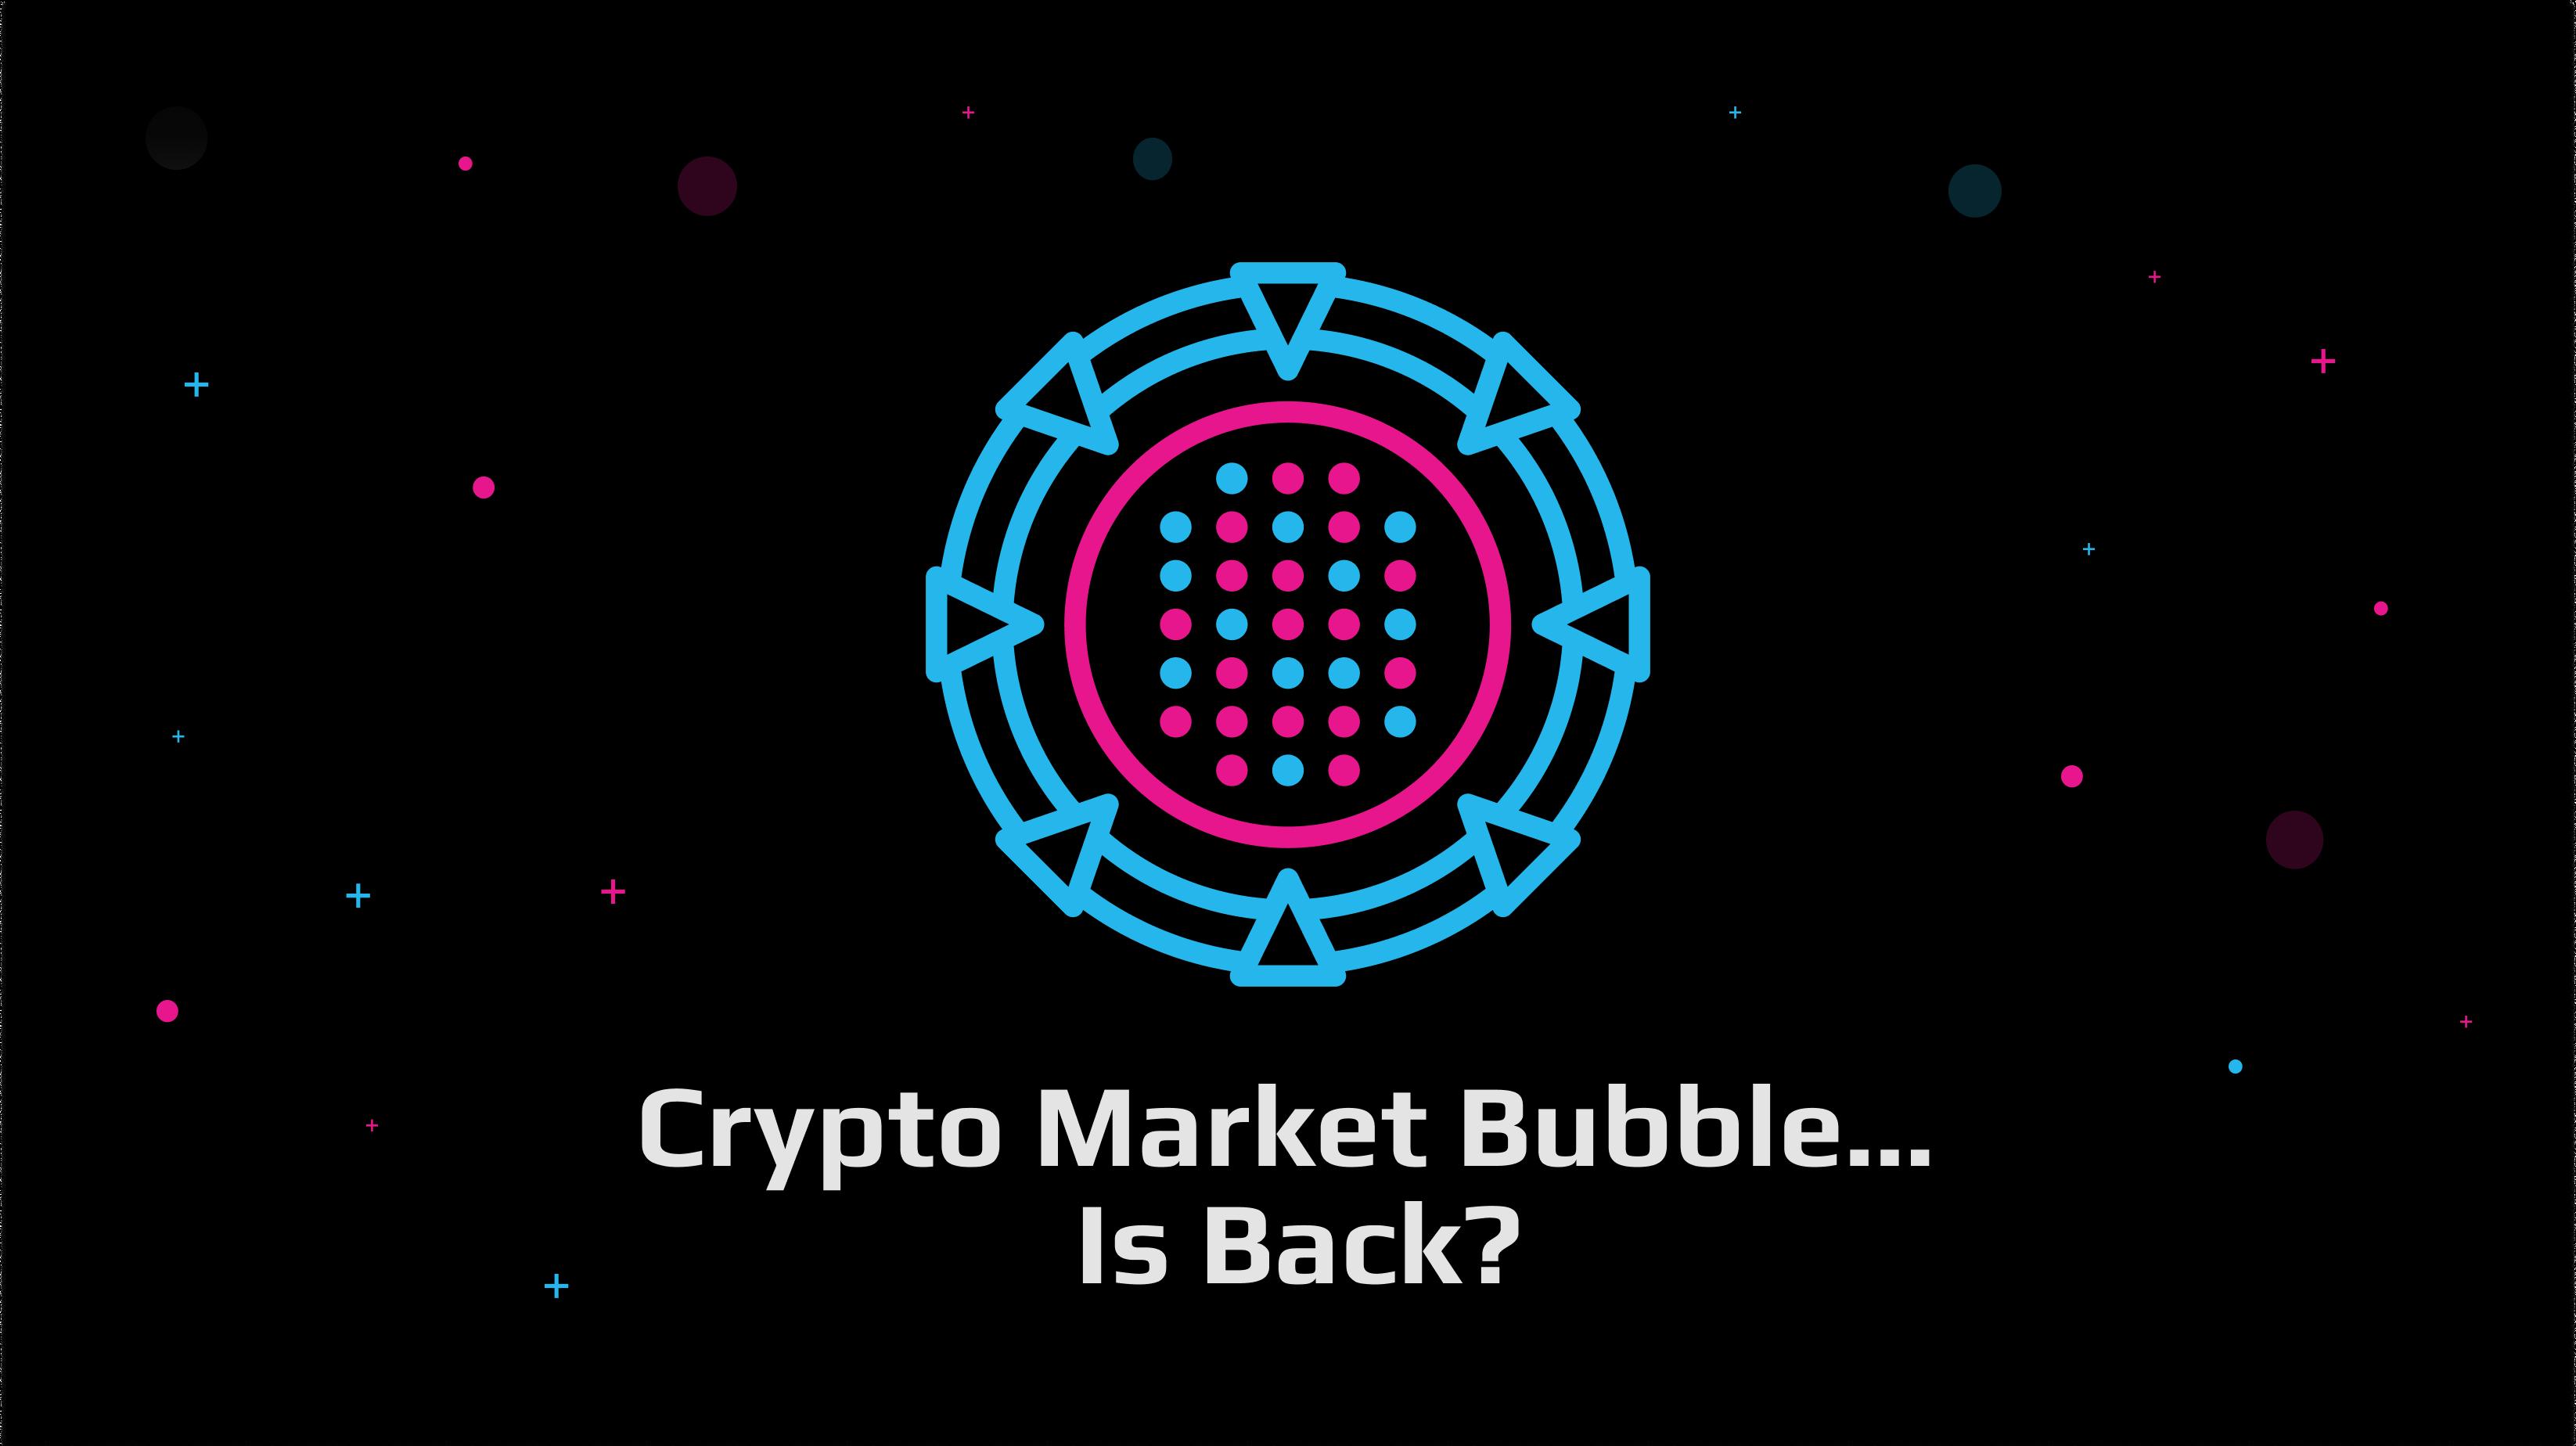 Crypto Market Bubble... Is Back?